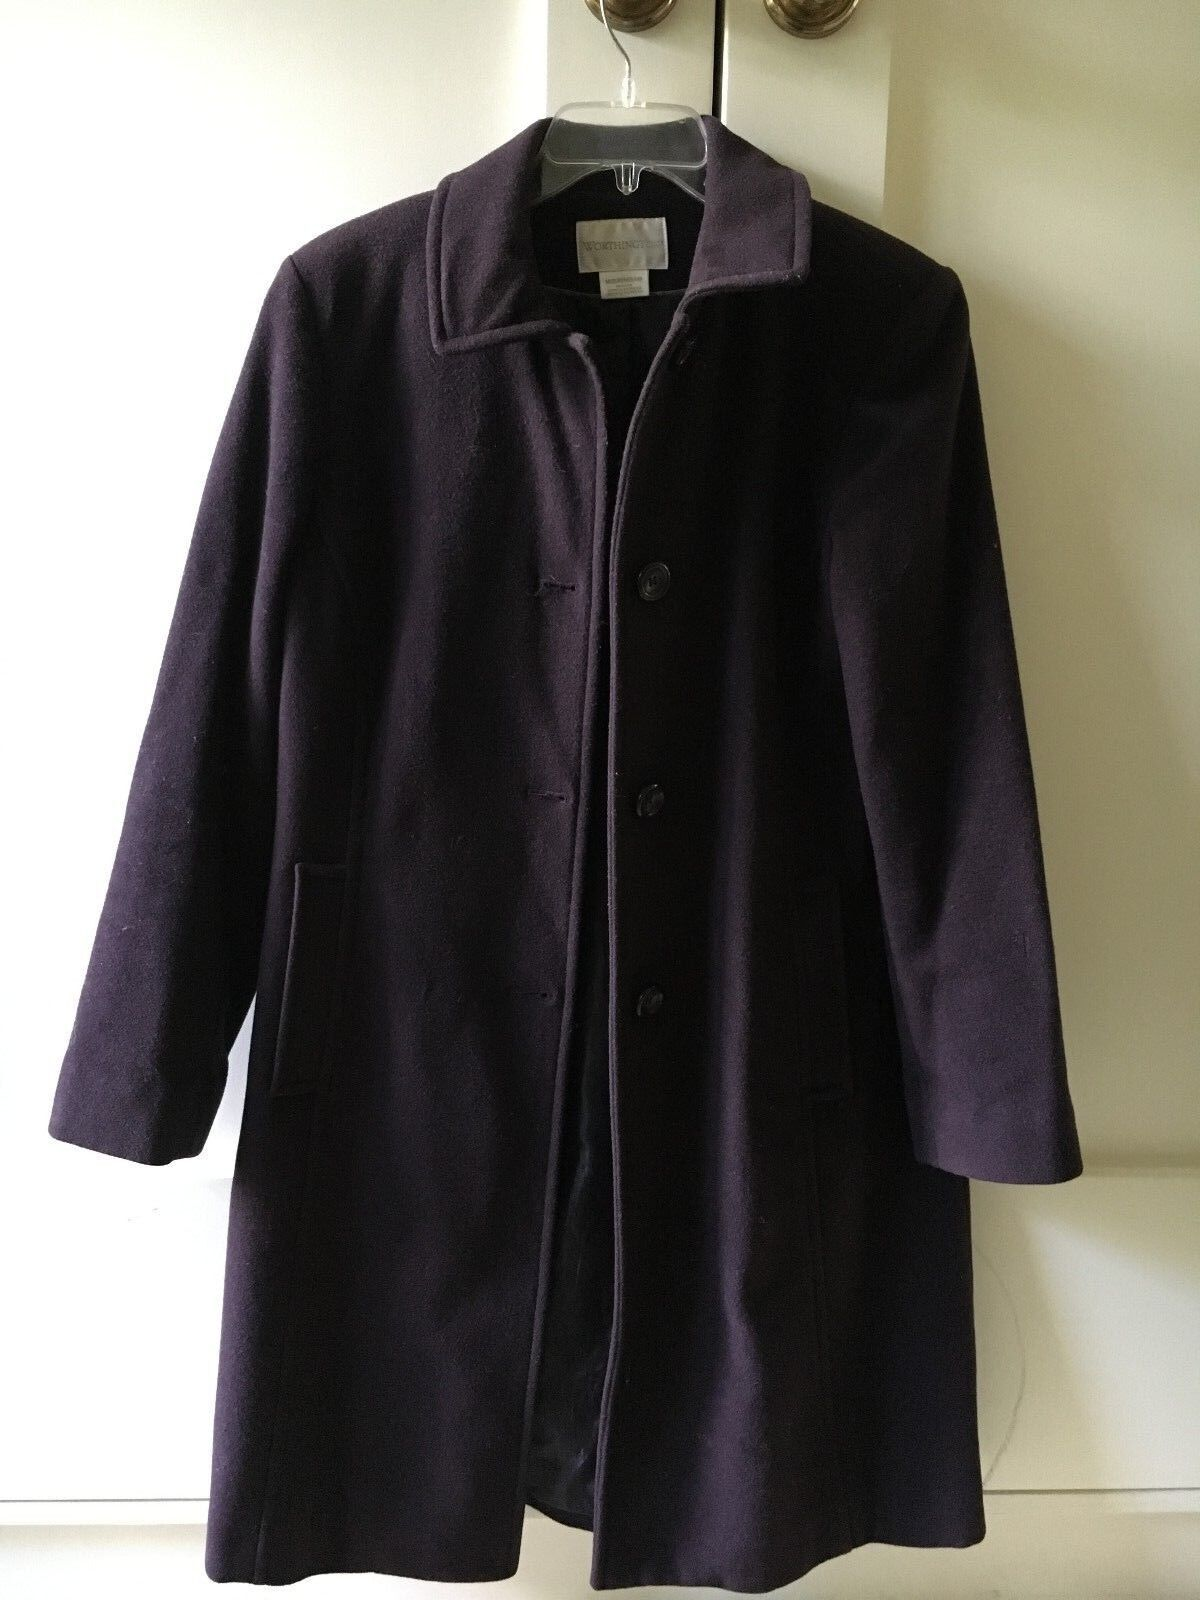 Worthington Plum Women Warm Coat 80% Wool SIZE M Winter Formal Stylish